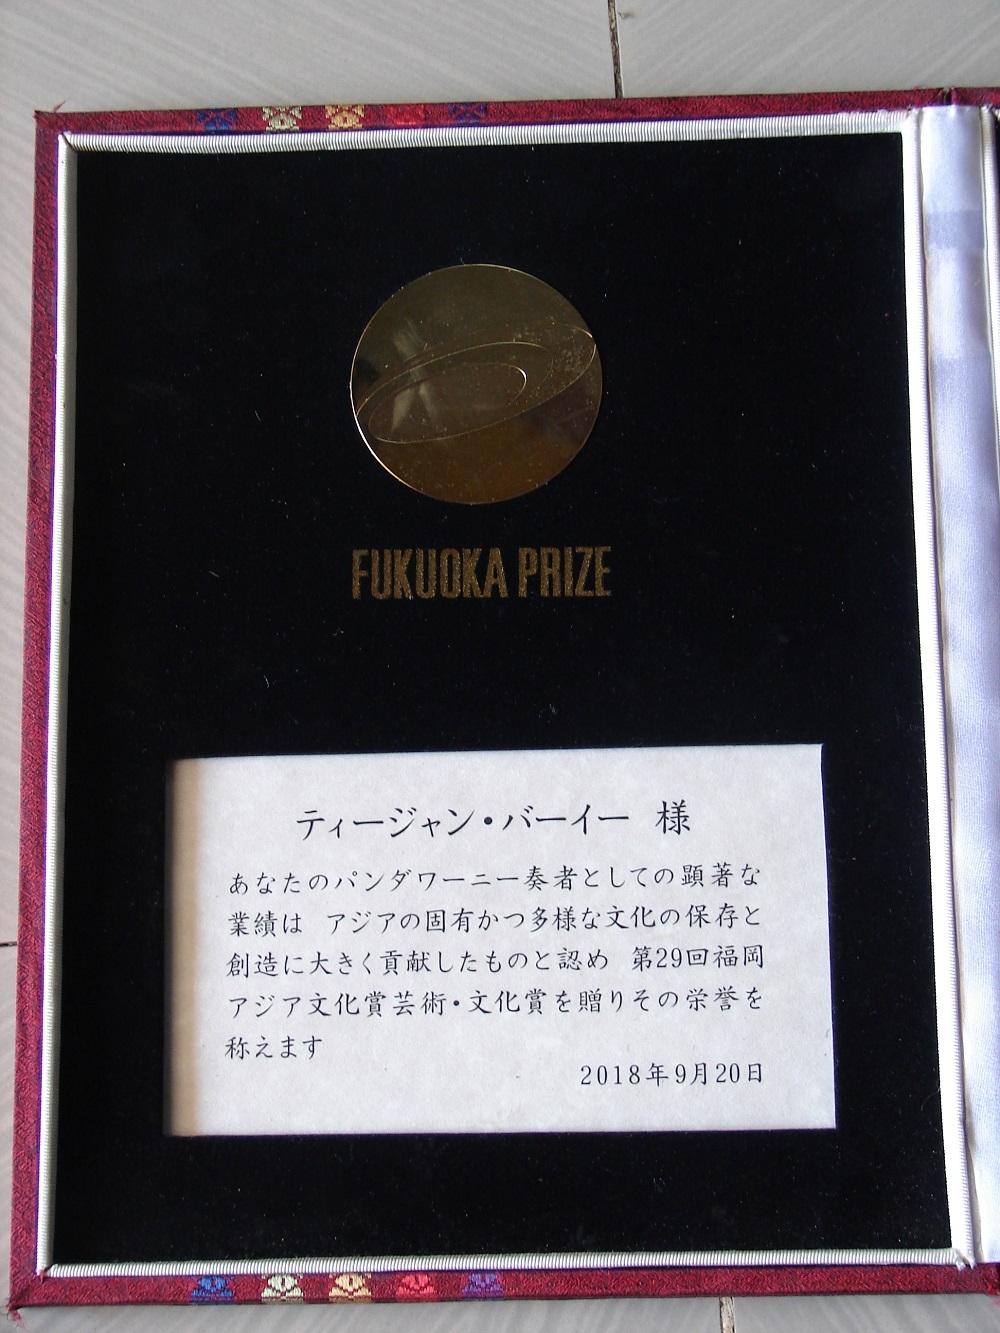 Fukuoka Prize